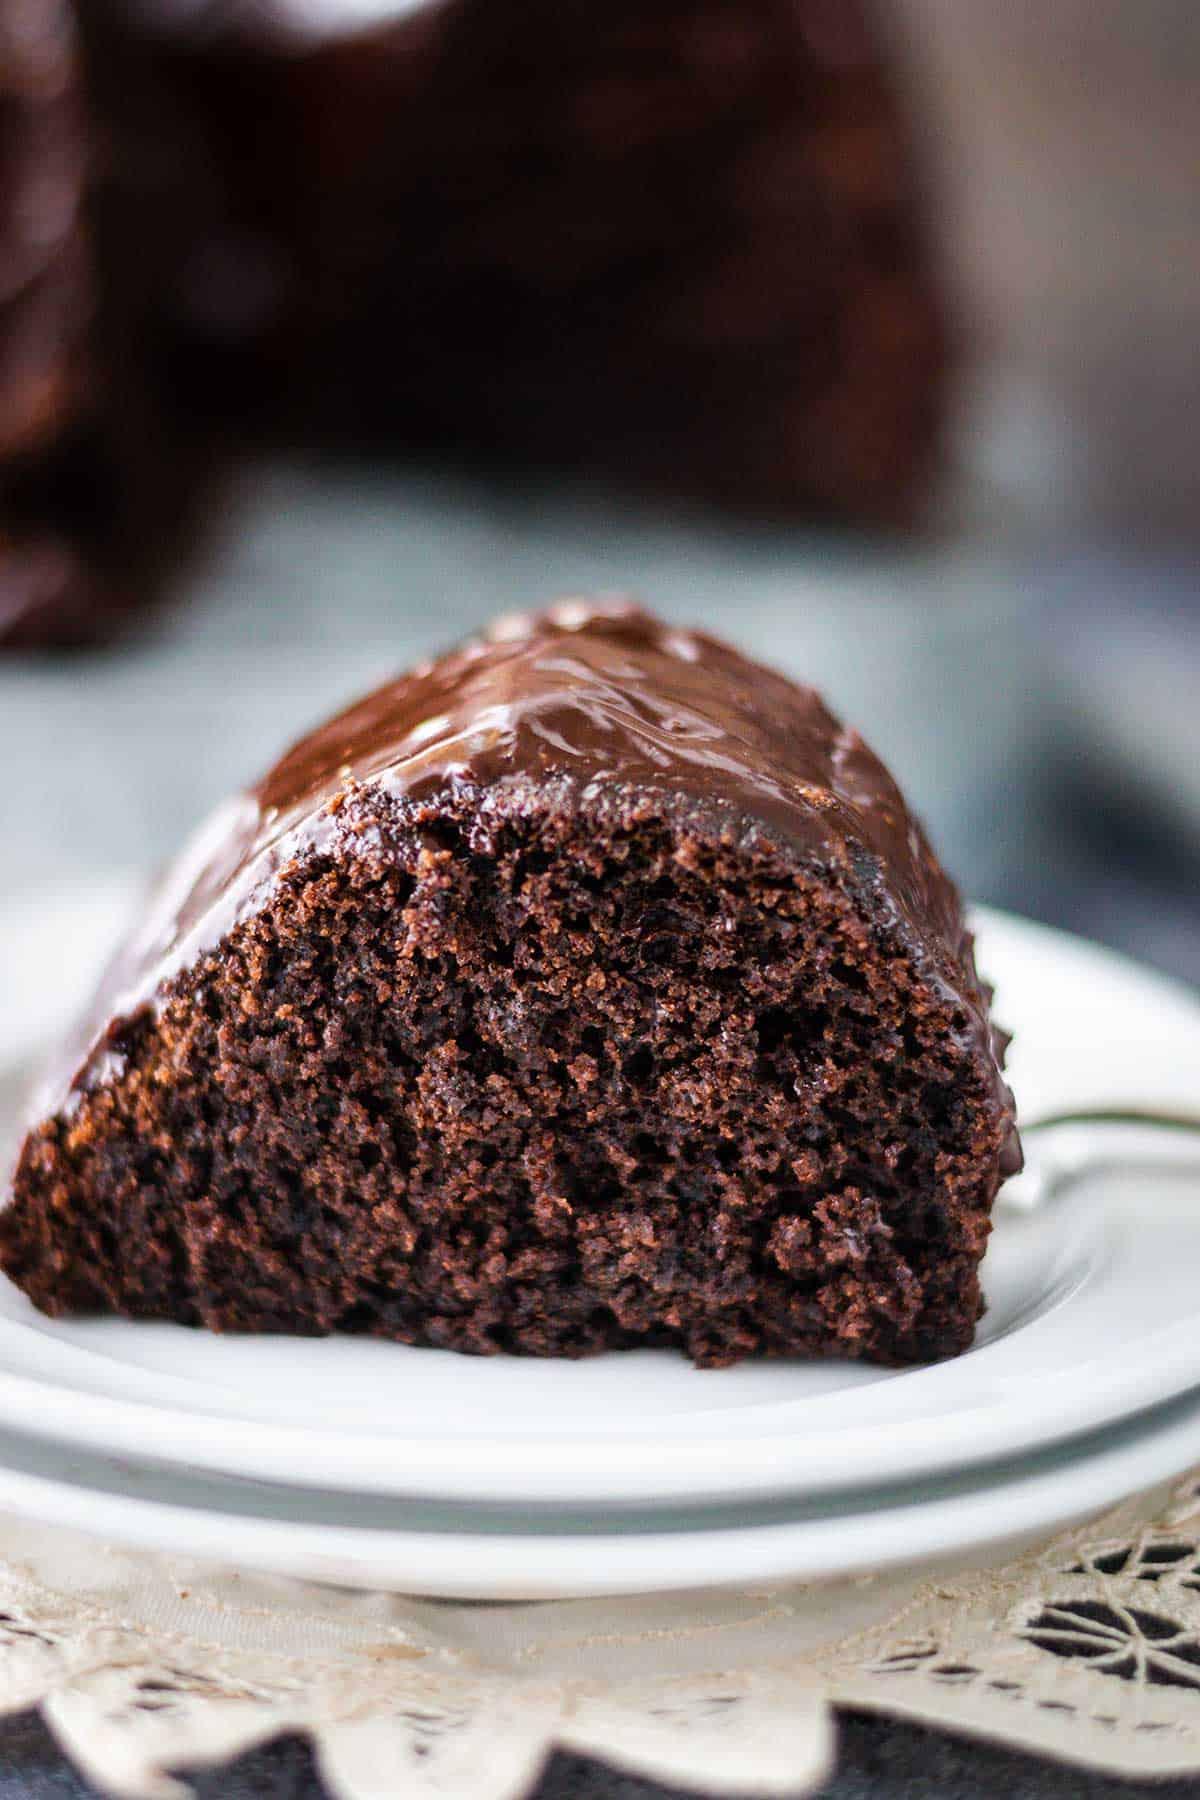 Upclose image of a chocolate brownie cake slice.